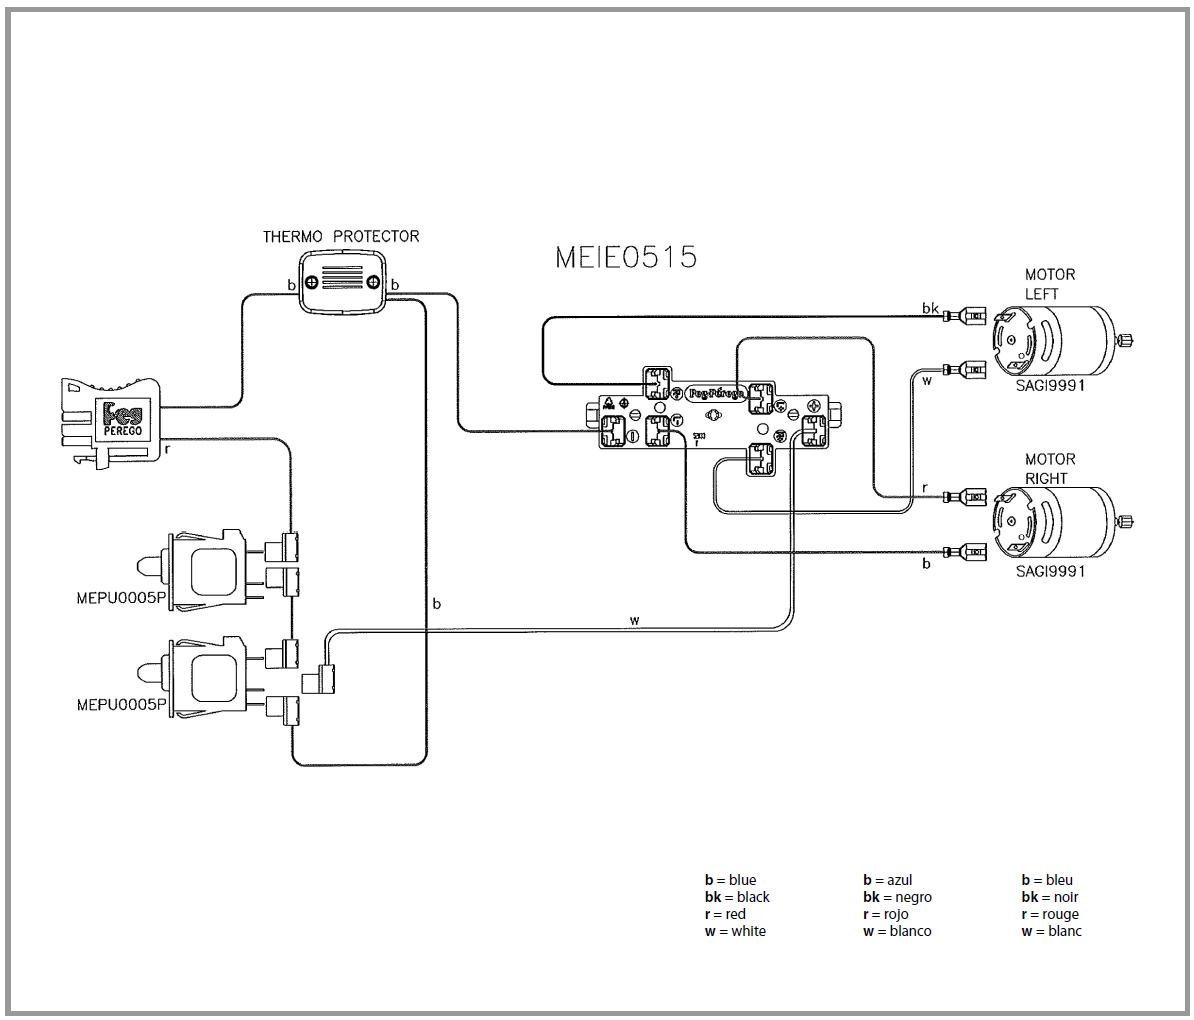 polaris sportsman 800 efi wiring diagram diagrams wiring. Black Bedroom Furniture Sets. Home Design Ideas